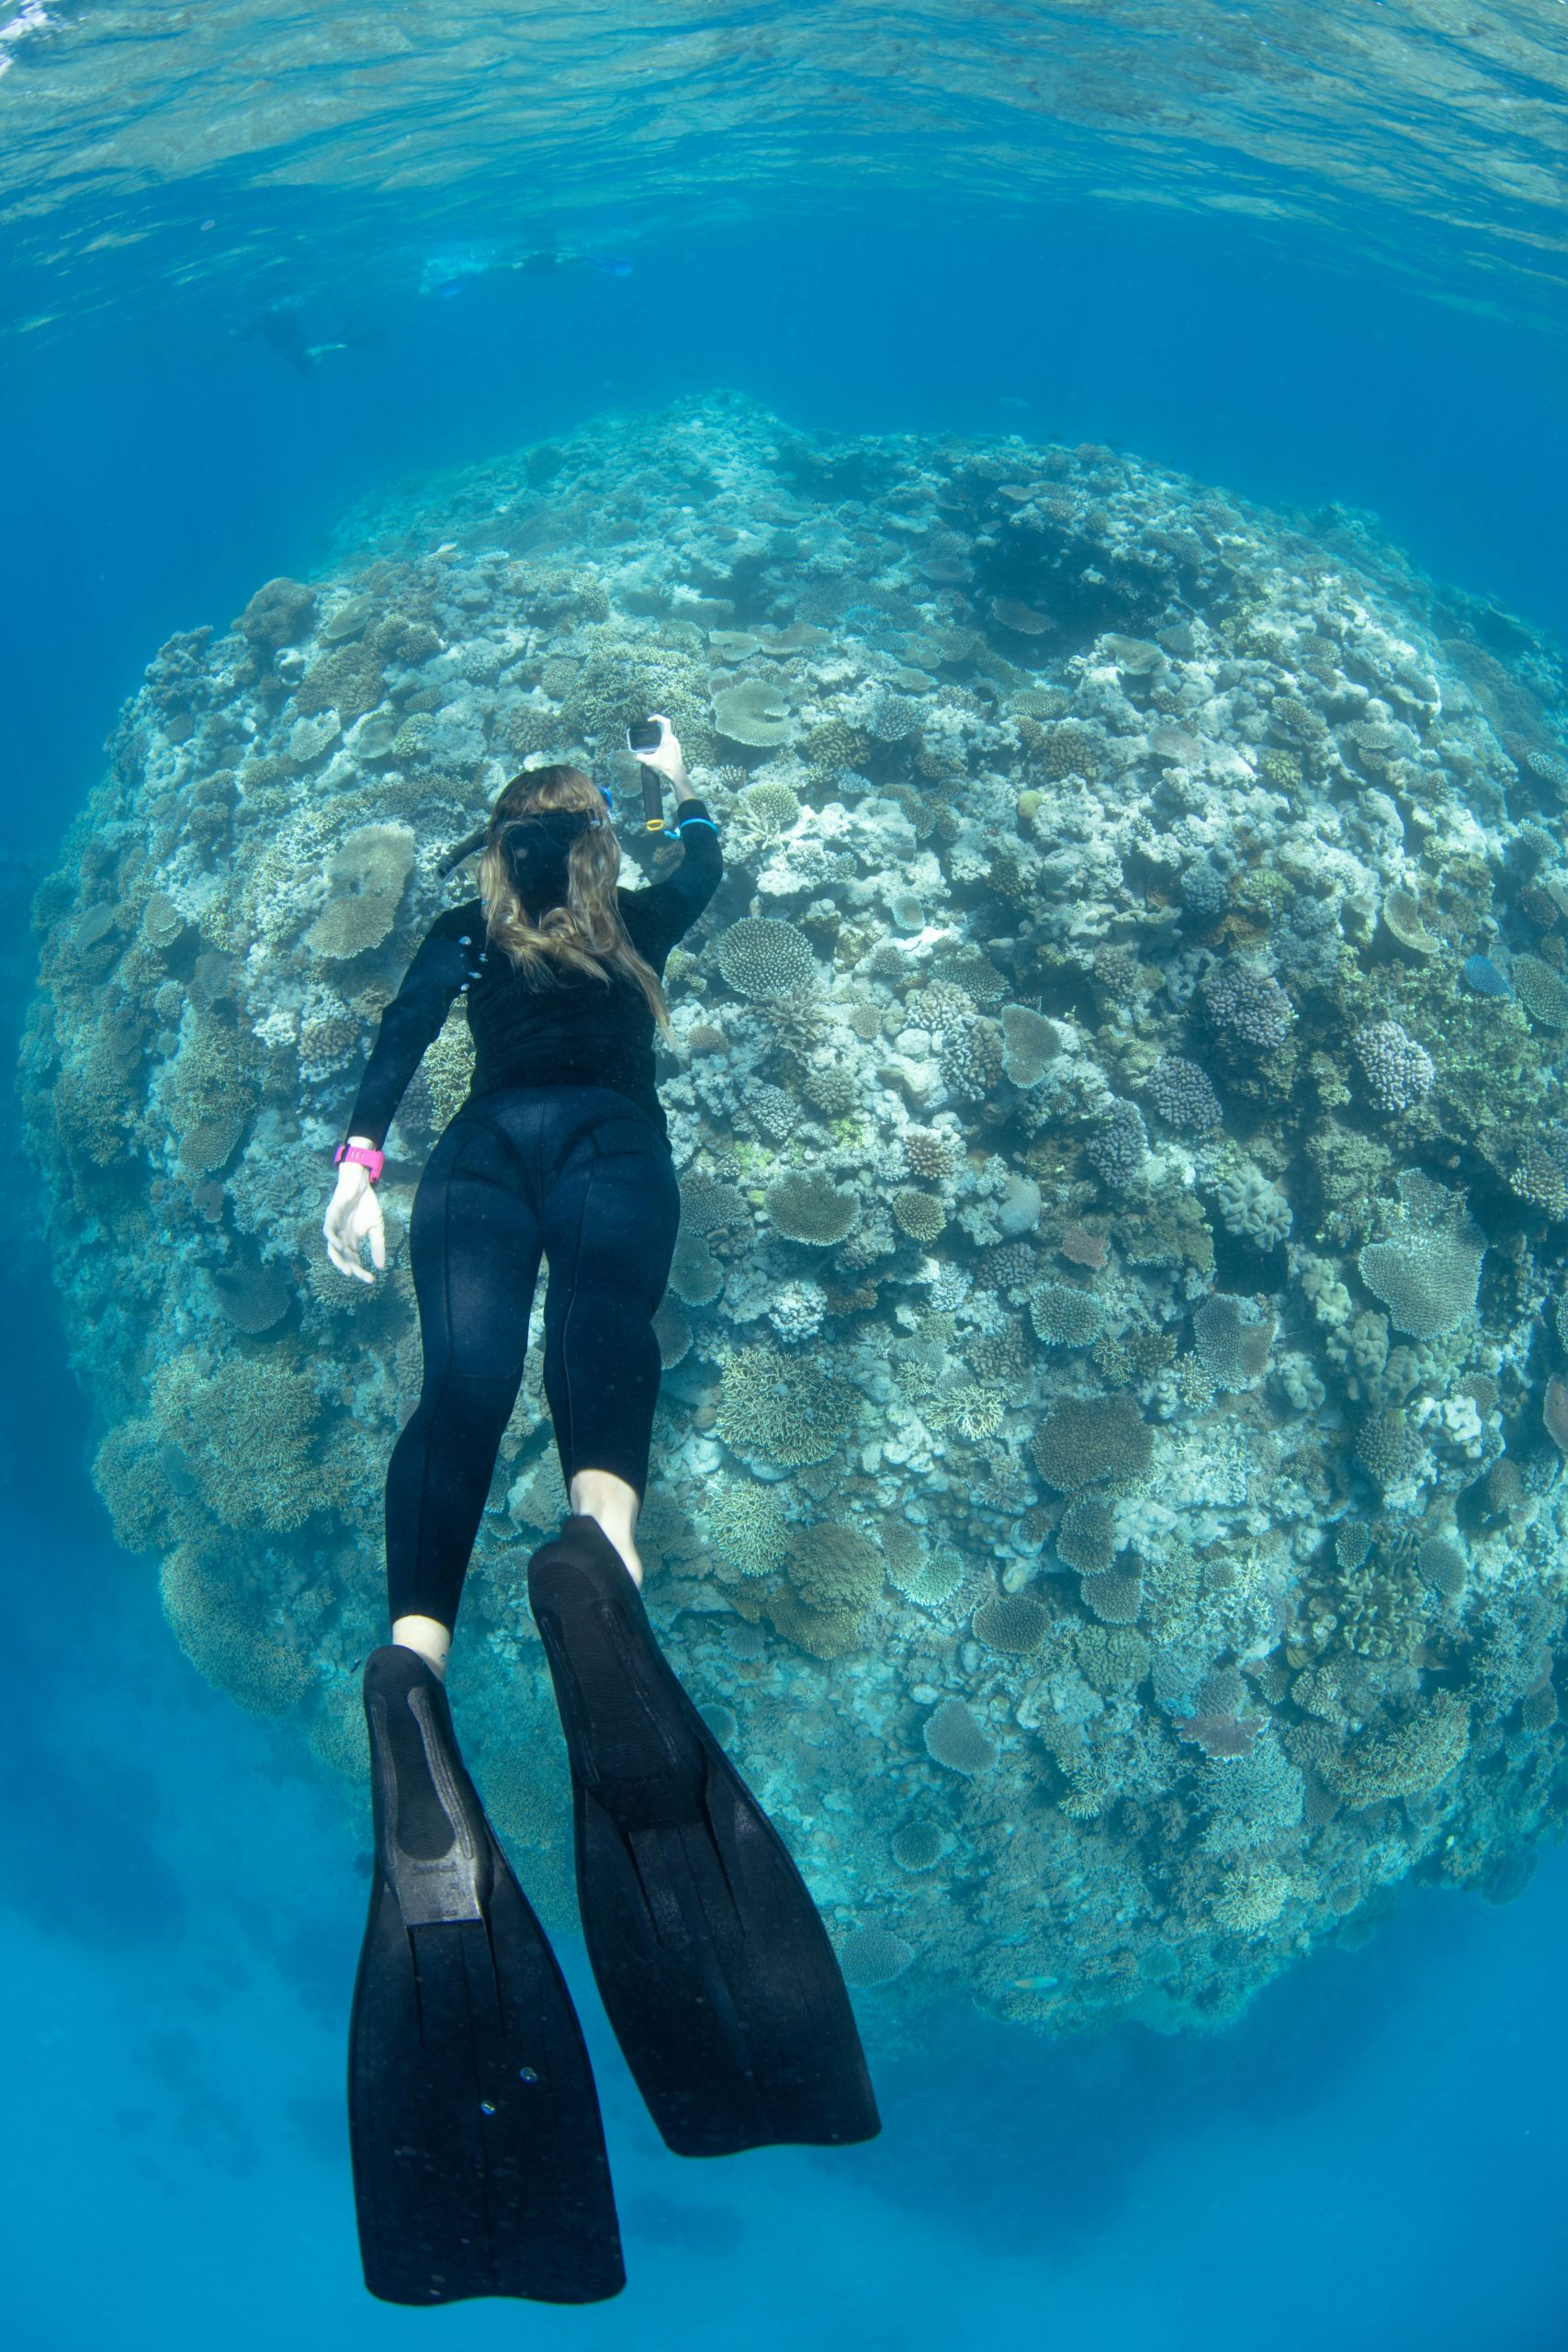 Diver Michelle Barry undertakes Great Reef Census survey. Credit: Gabriel Guzman. Underwater images